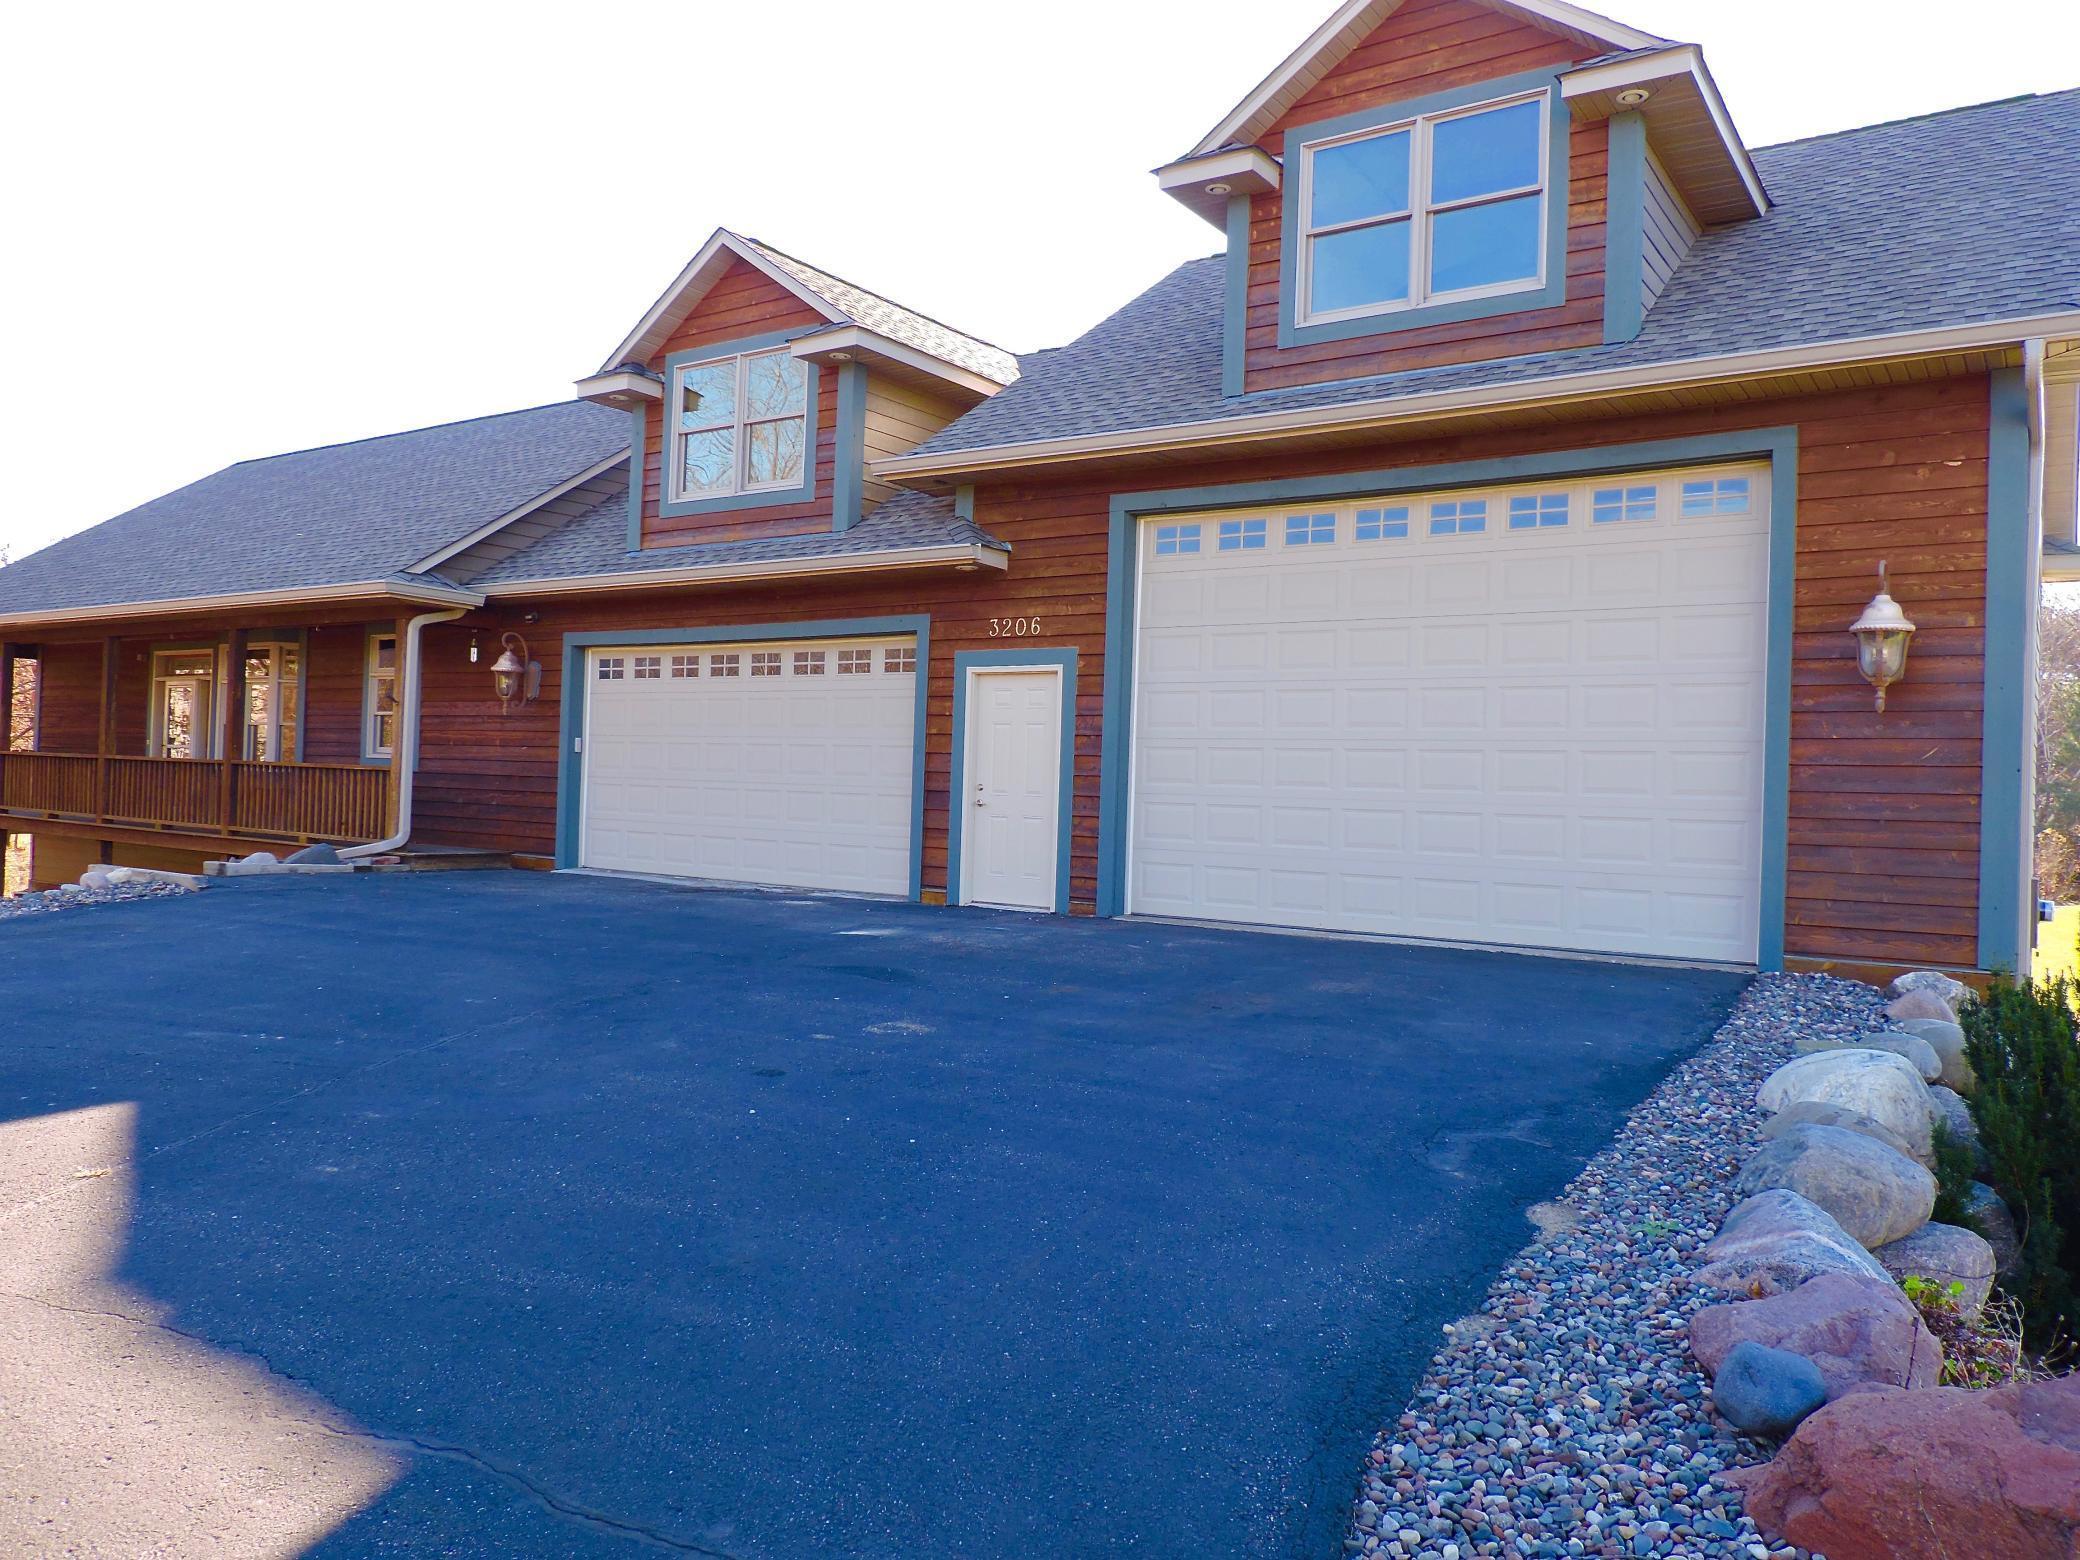 3206 144th Avenue NE Property Photo - Ham Lake, MN real estate listing